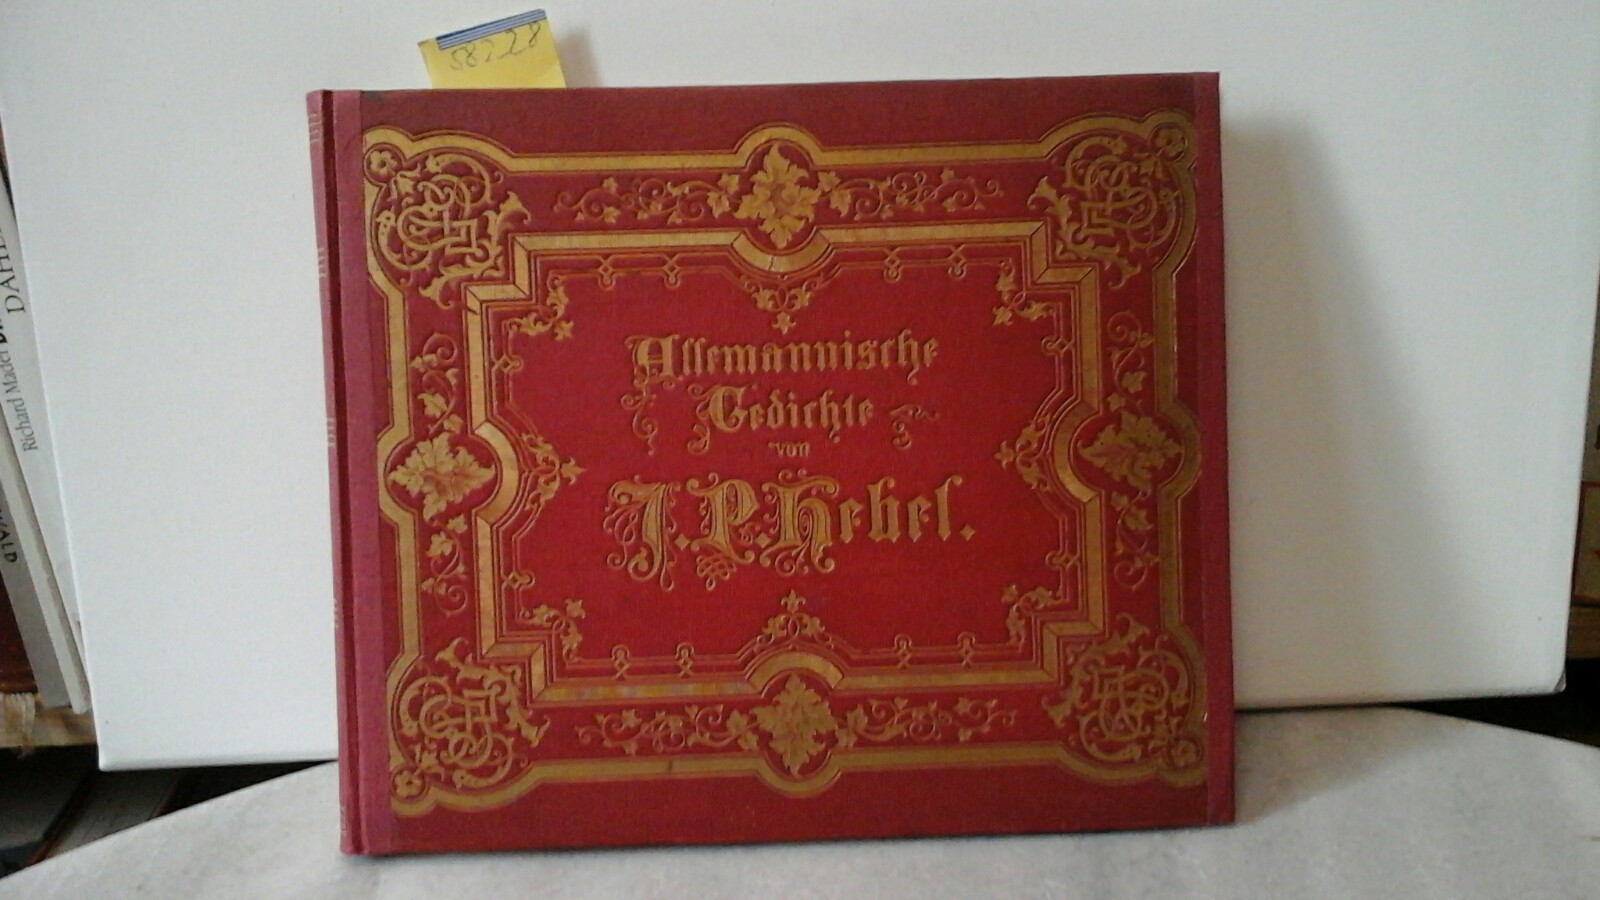 Dreißig Umrisse zu J.(ohann) P.(eter) Hebel